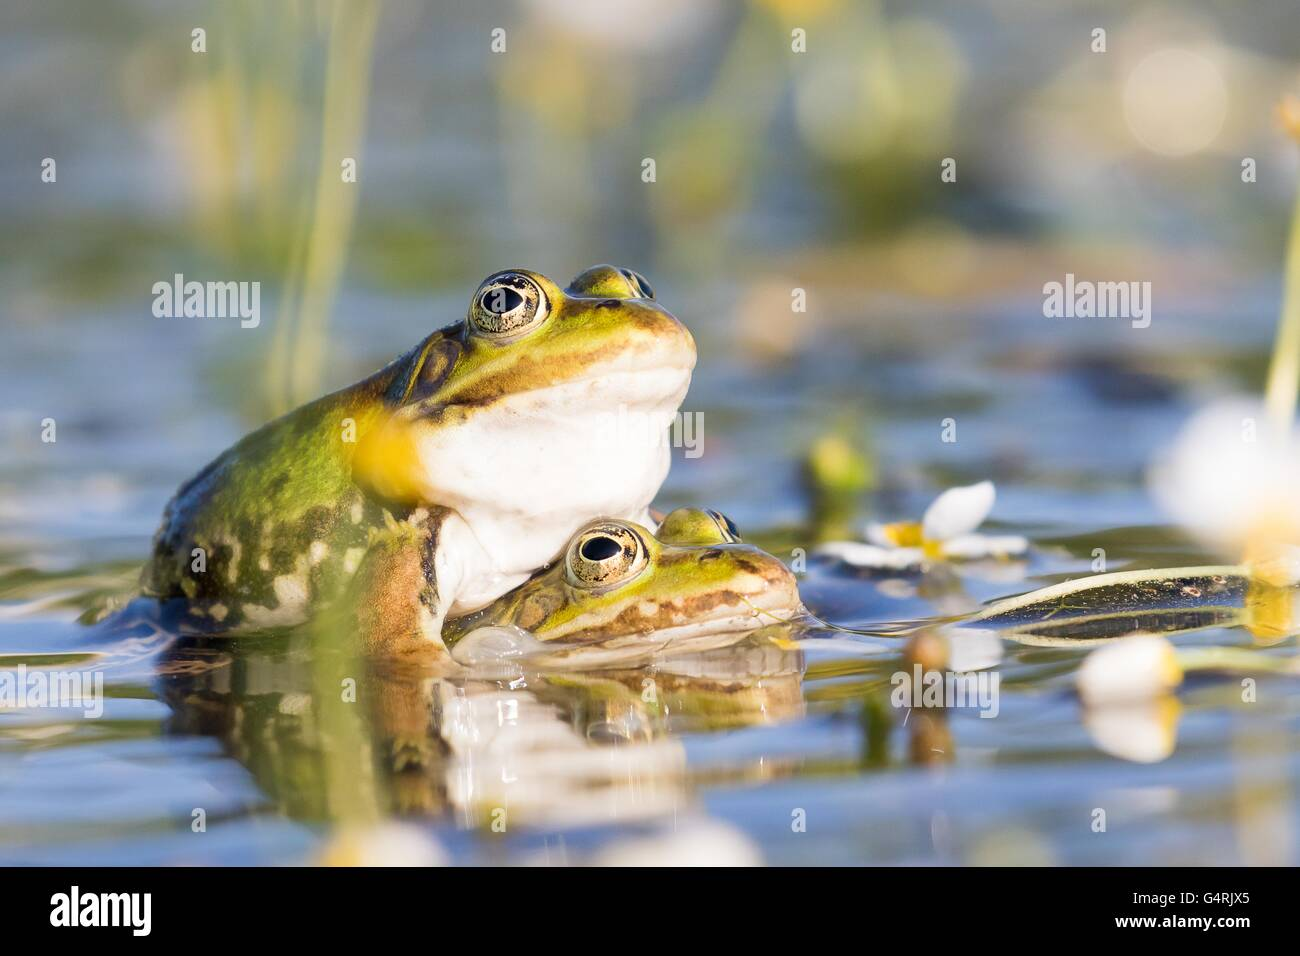 Edible frogs (Pelophylax esculentus) in water, mating, white water-crowfoot (Ranunculus aquatilis), Hesse, Germany - Stock Image